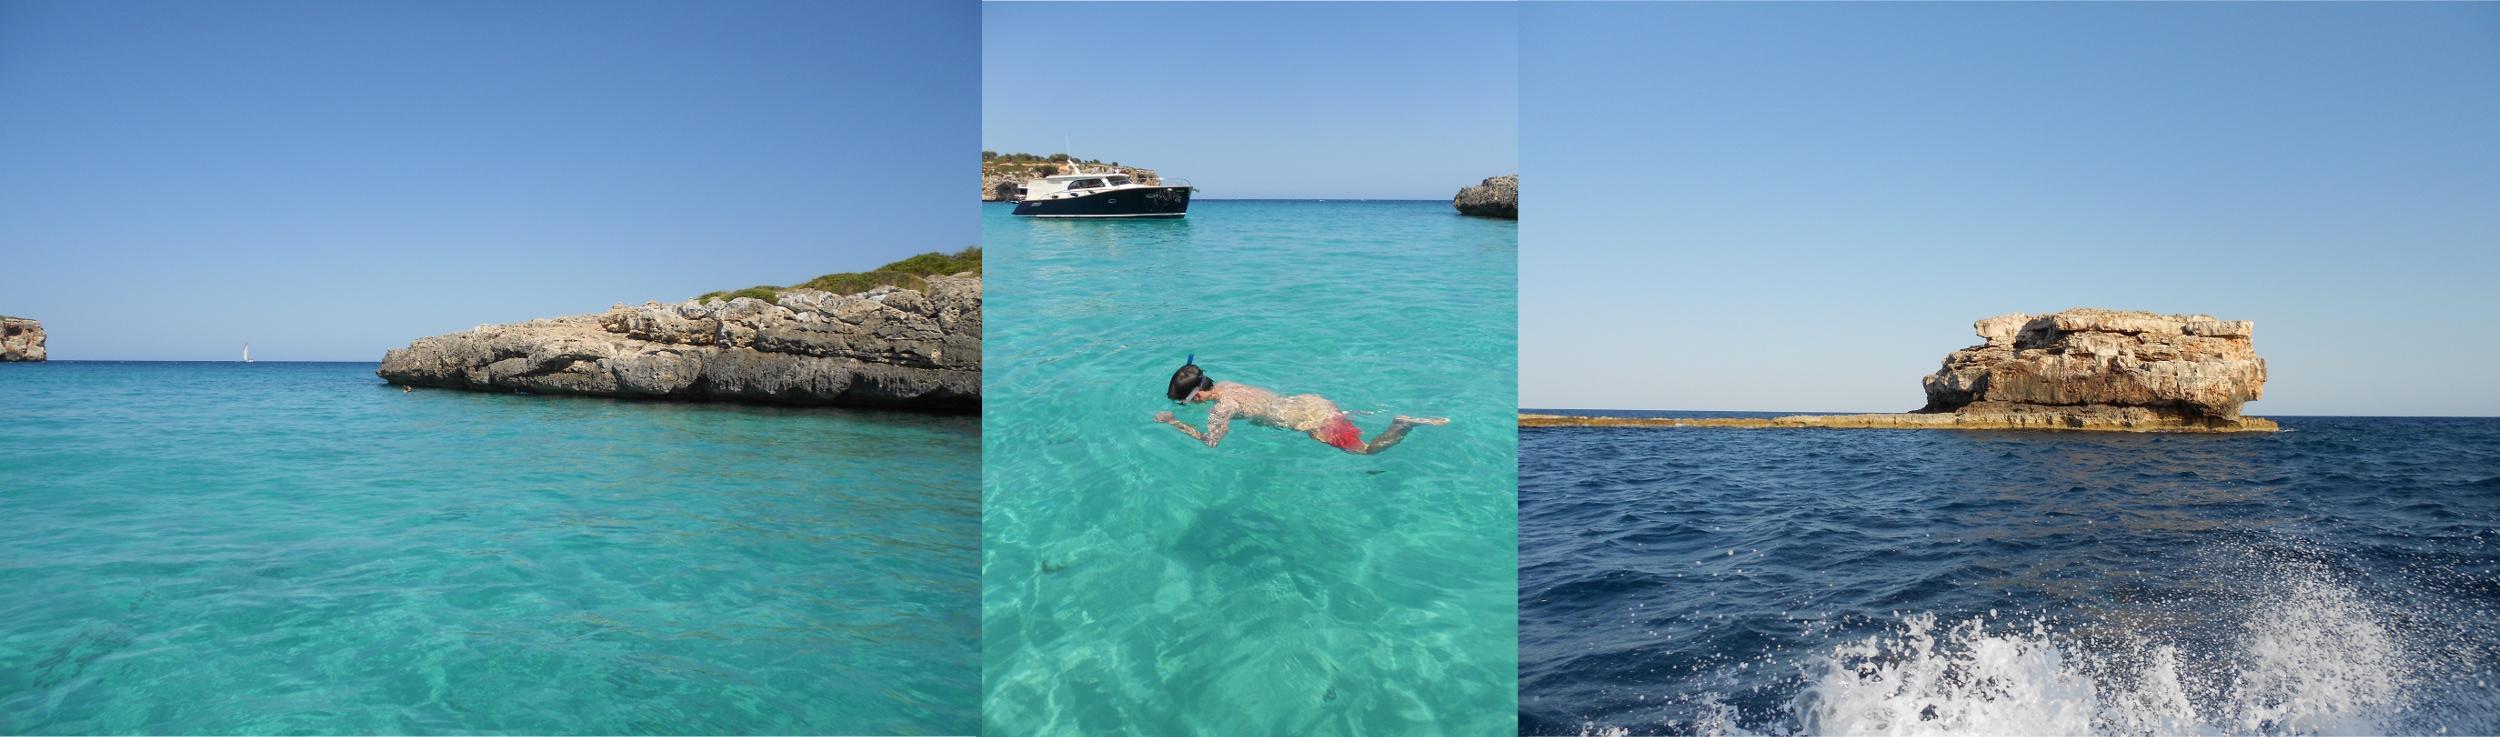 Bootstour Mallorca